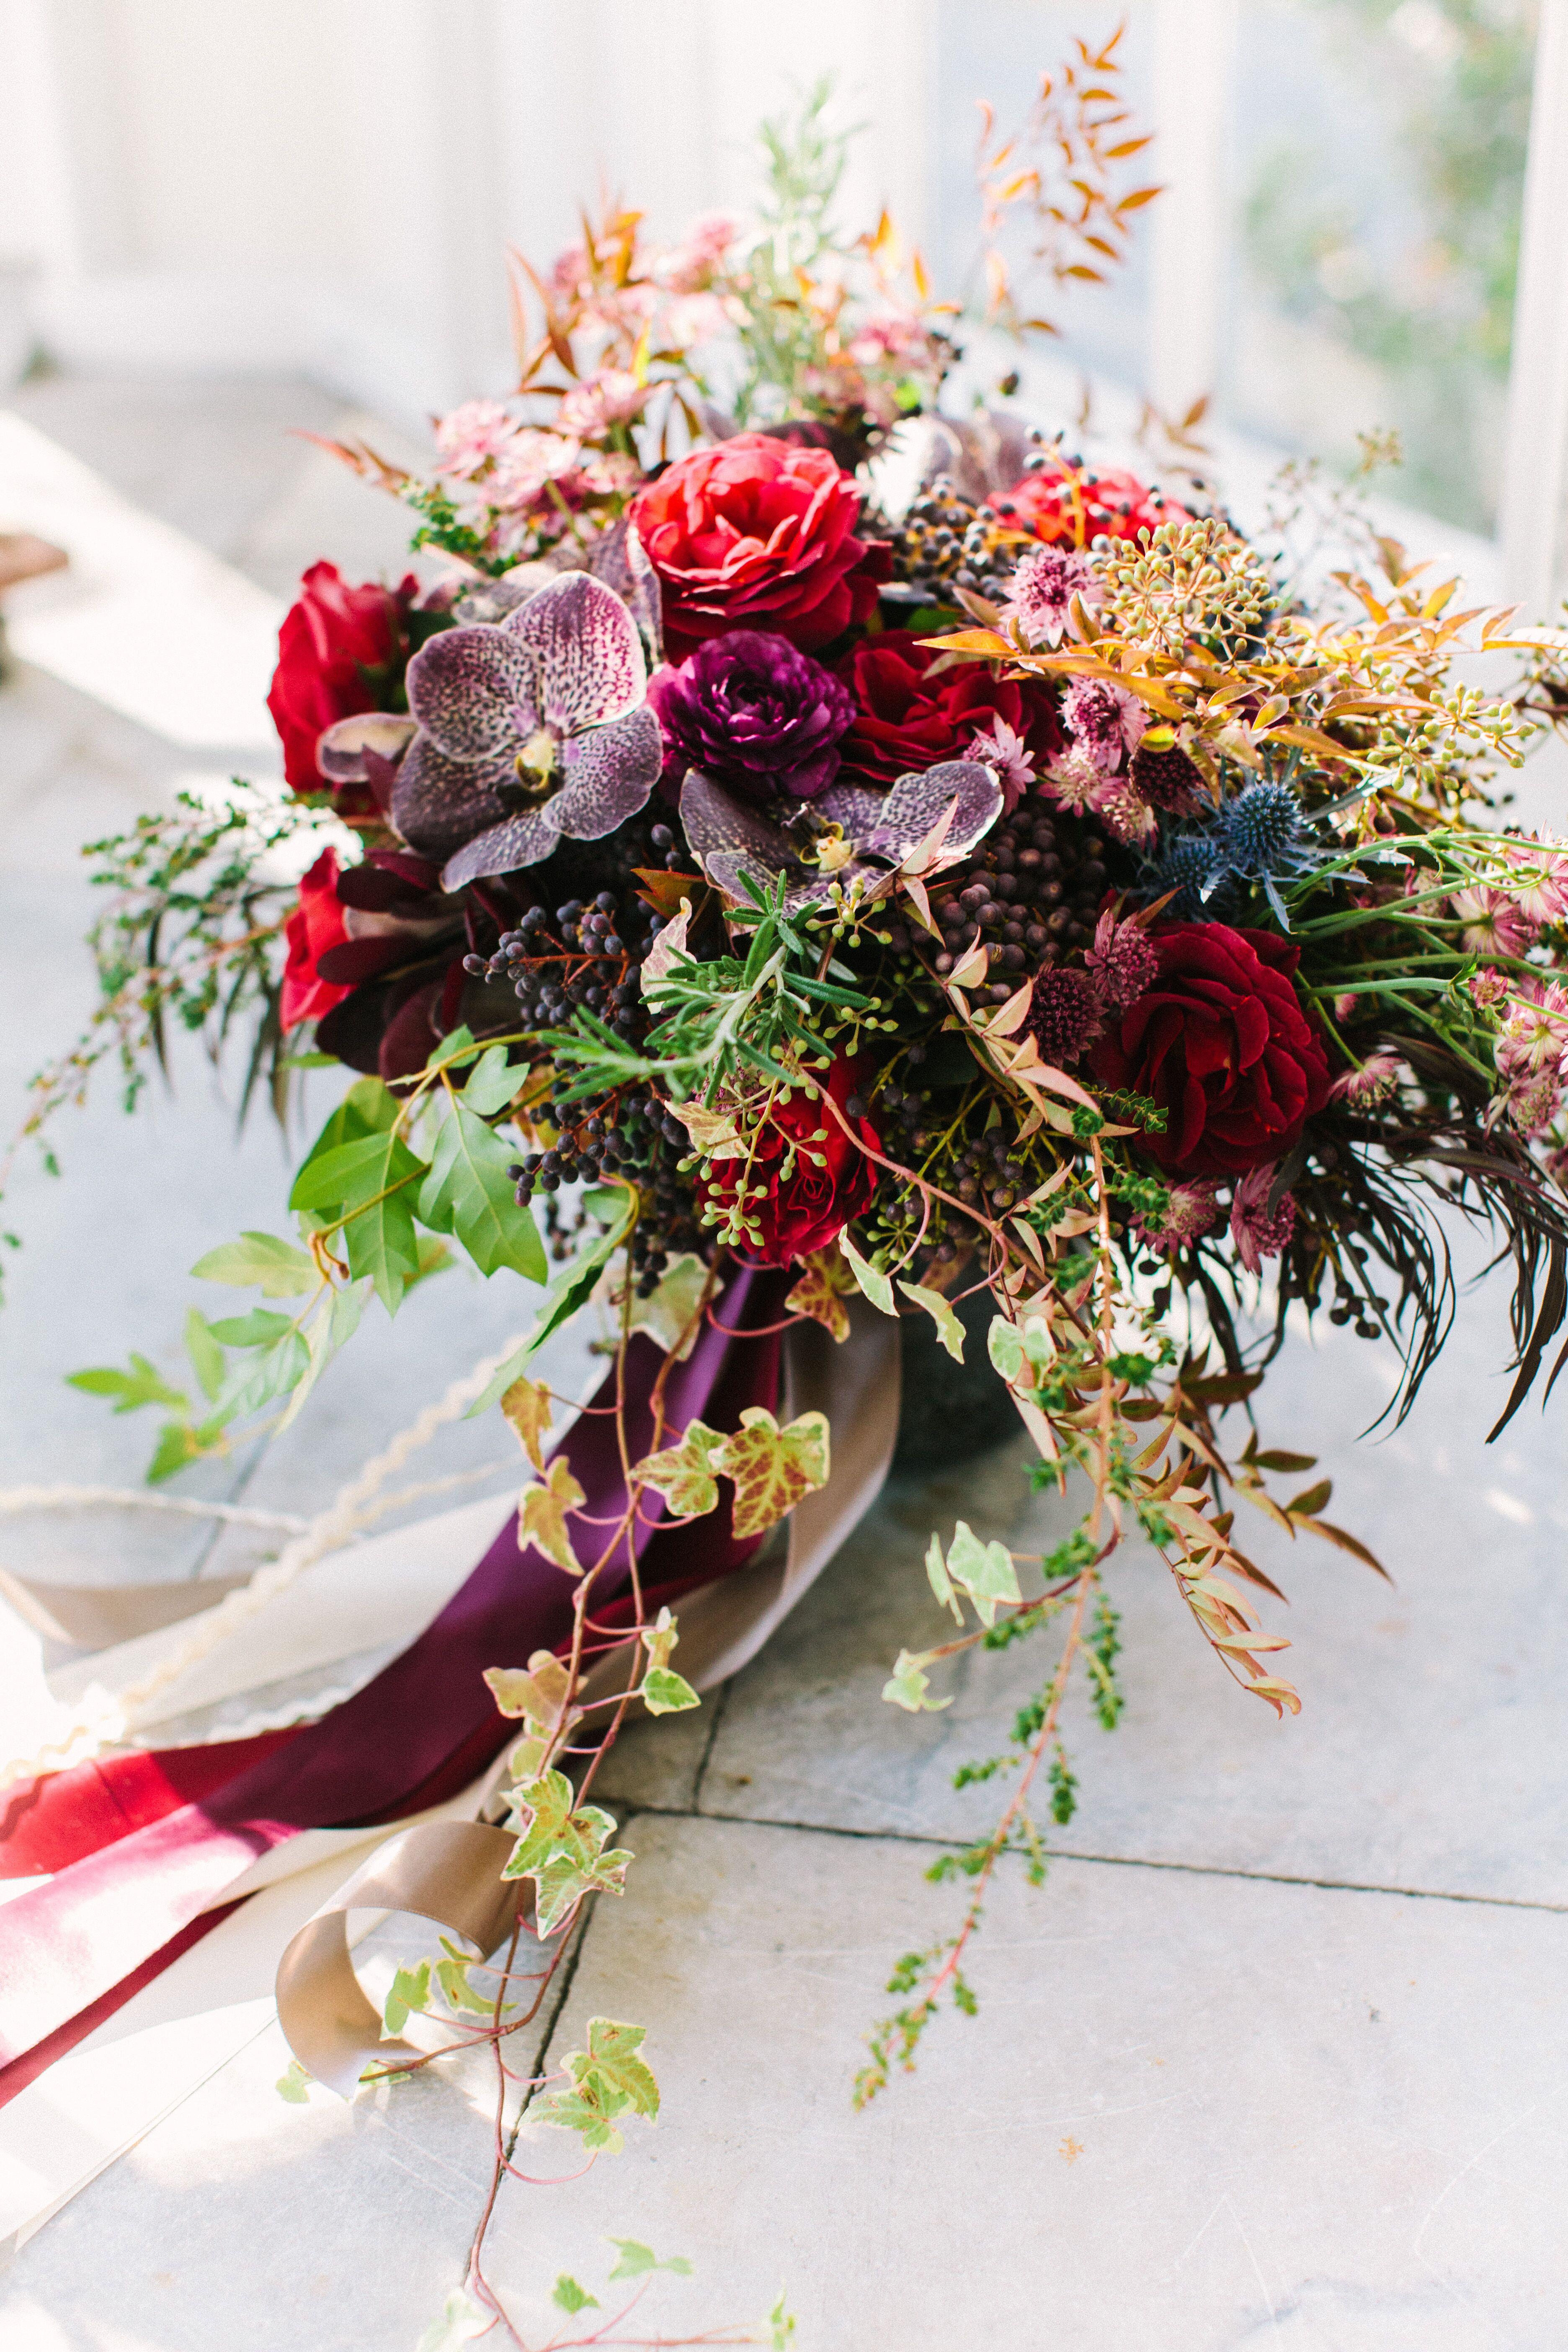 Romantic Hotel Room Ideas: Textured, Rustic Fall Bridal Bouquet